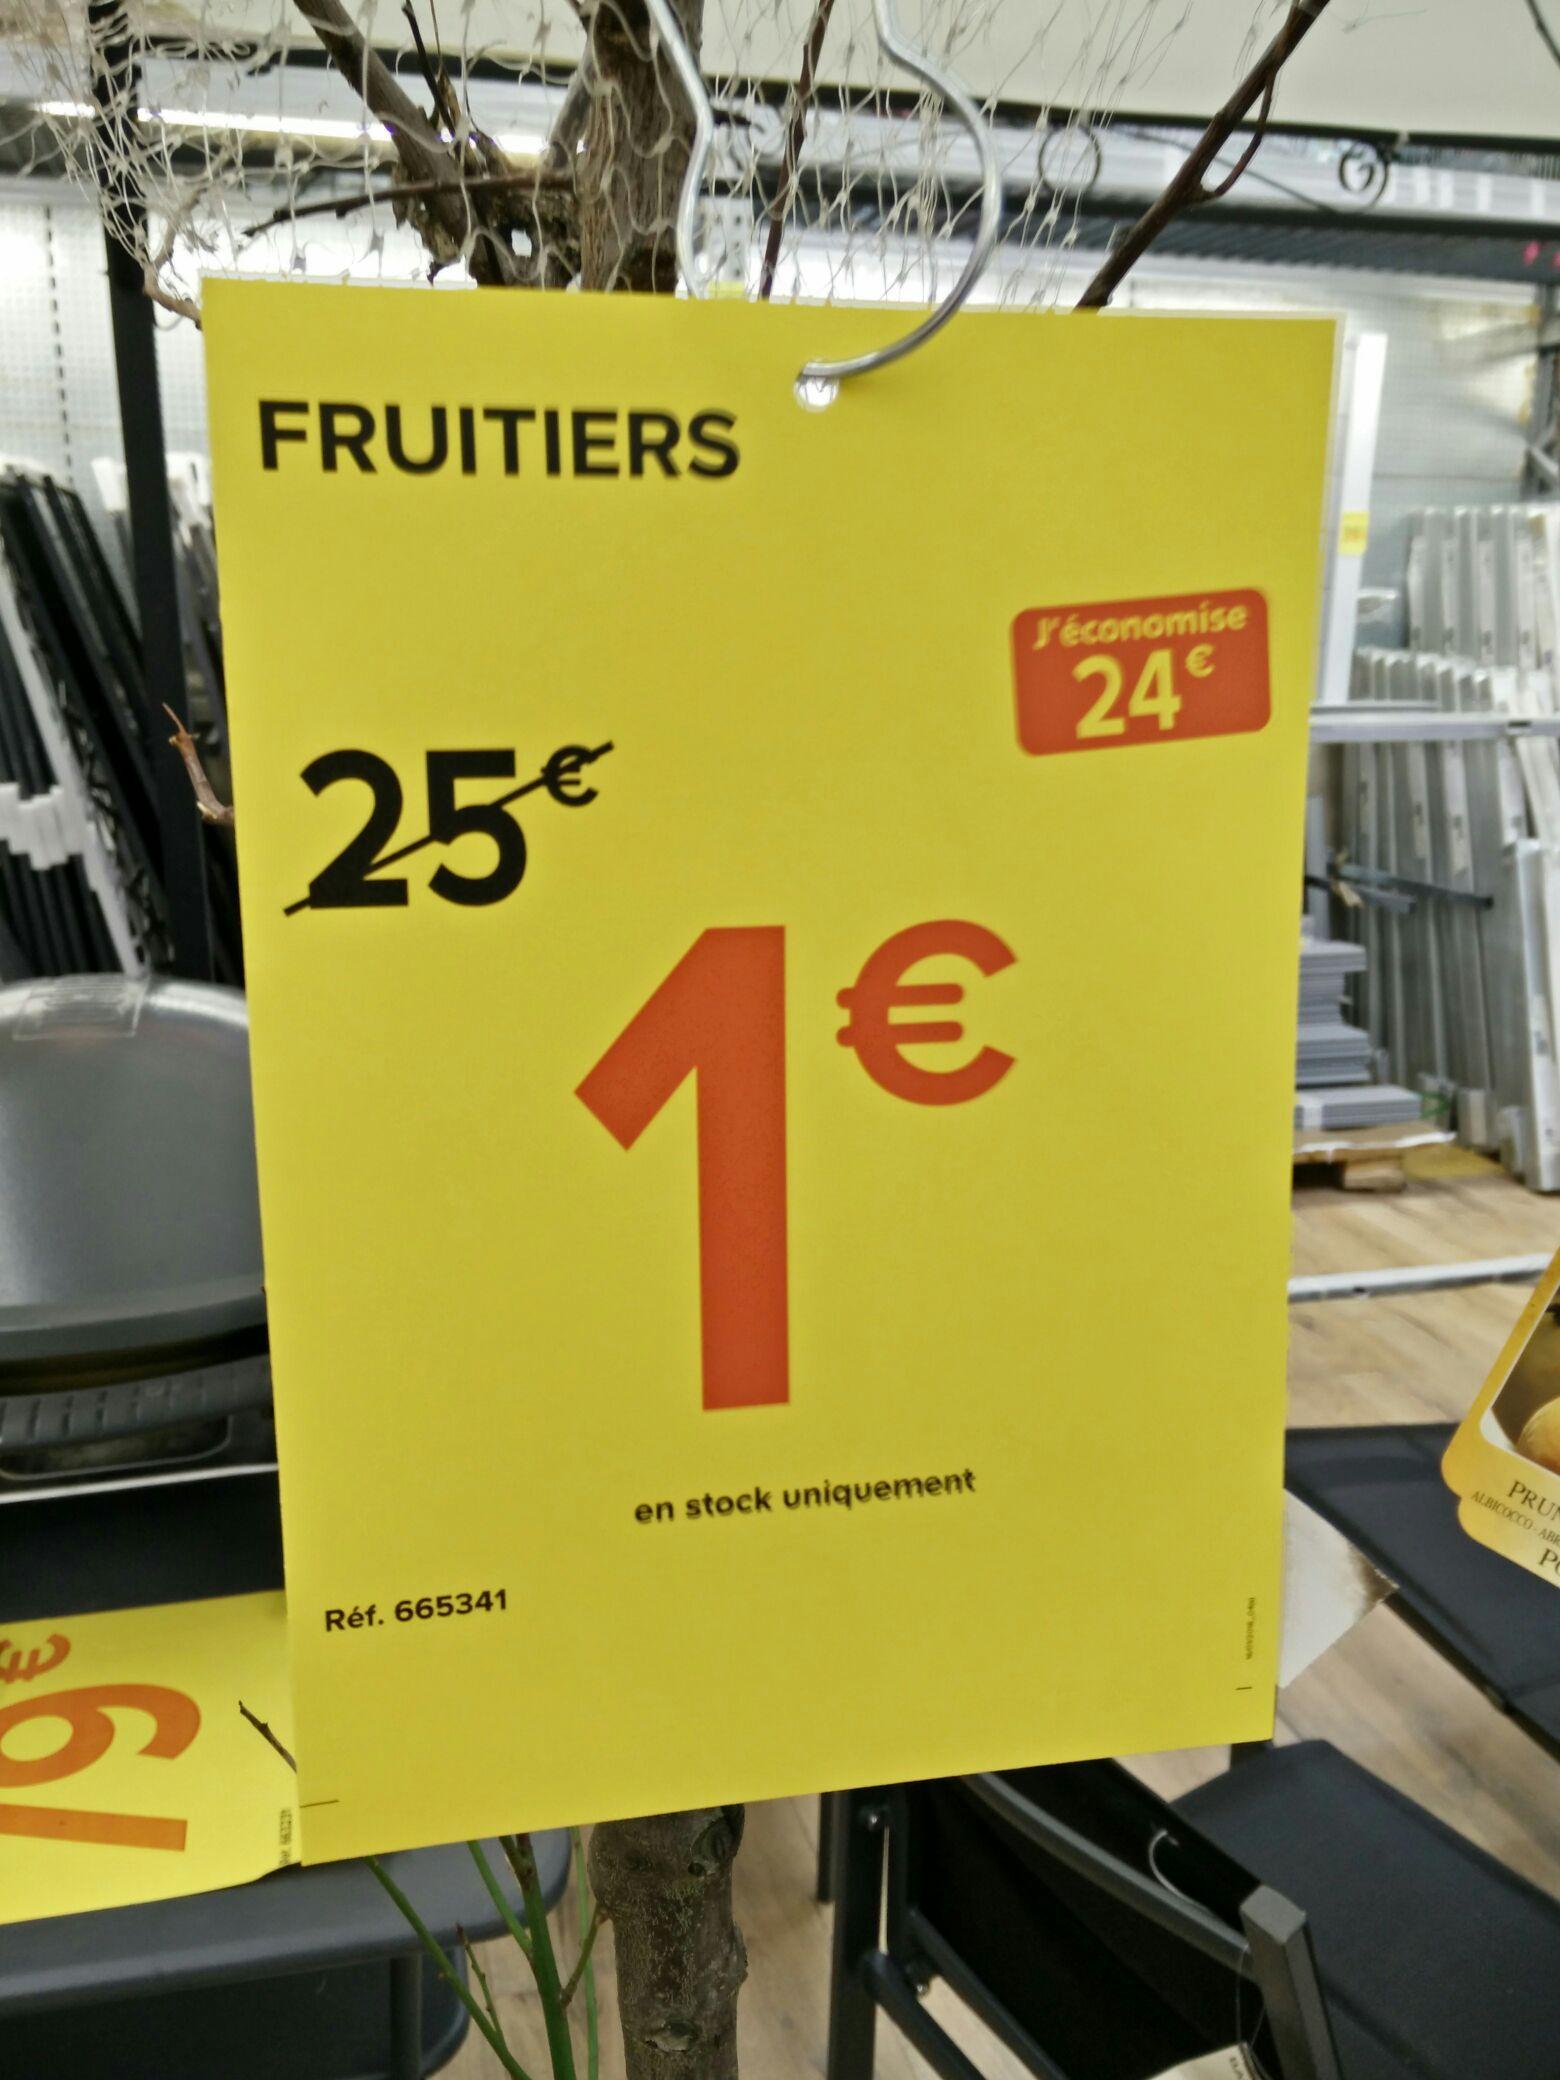 Divers arbres fruitiers